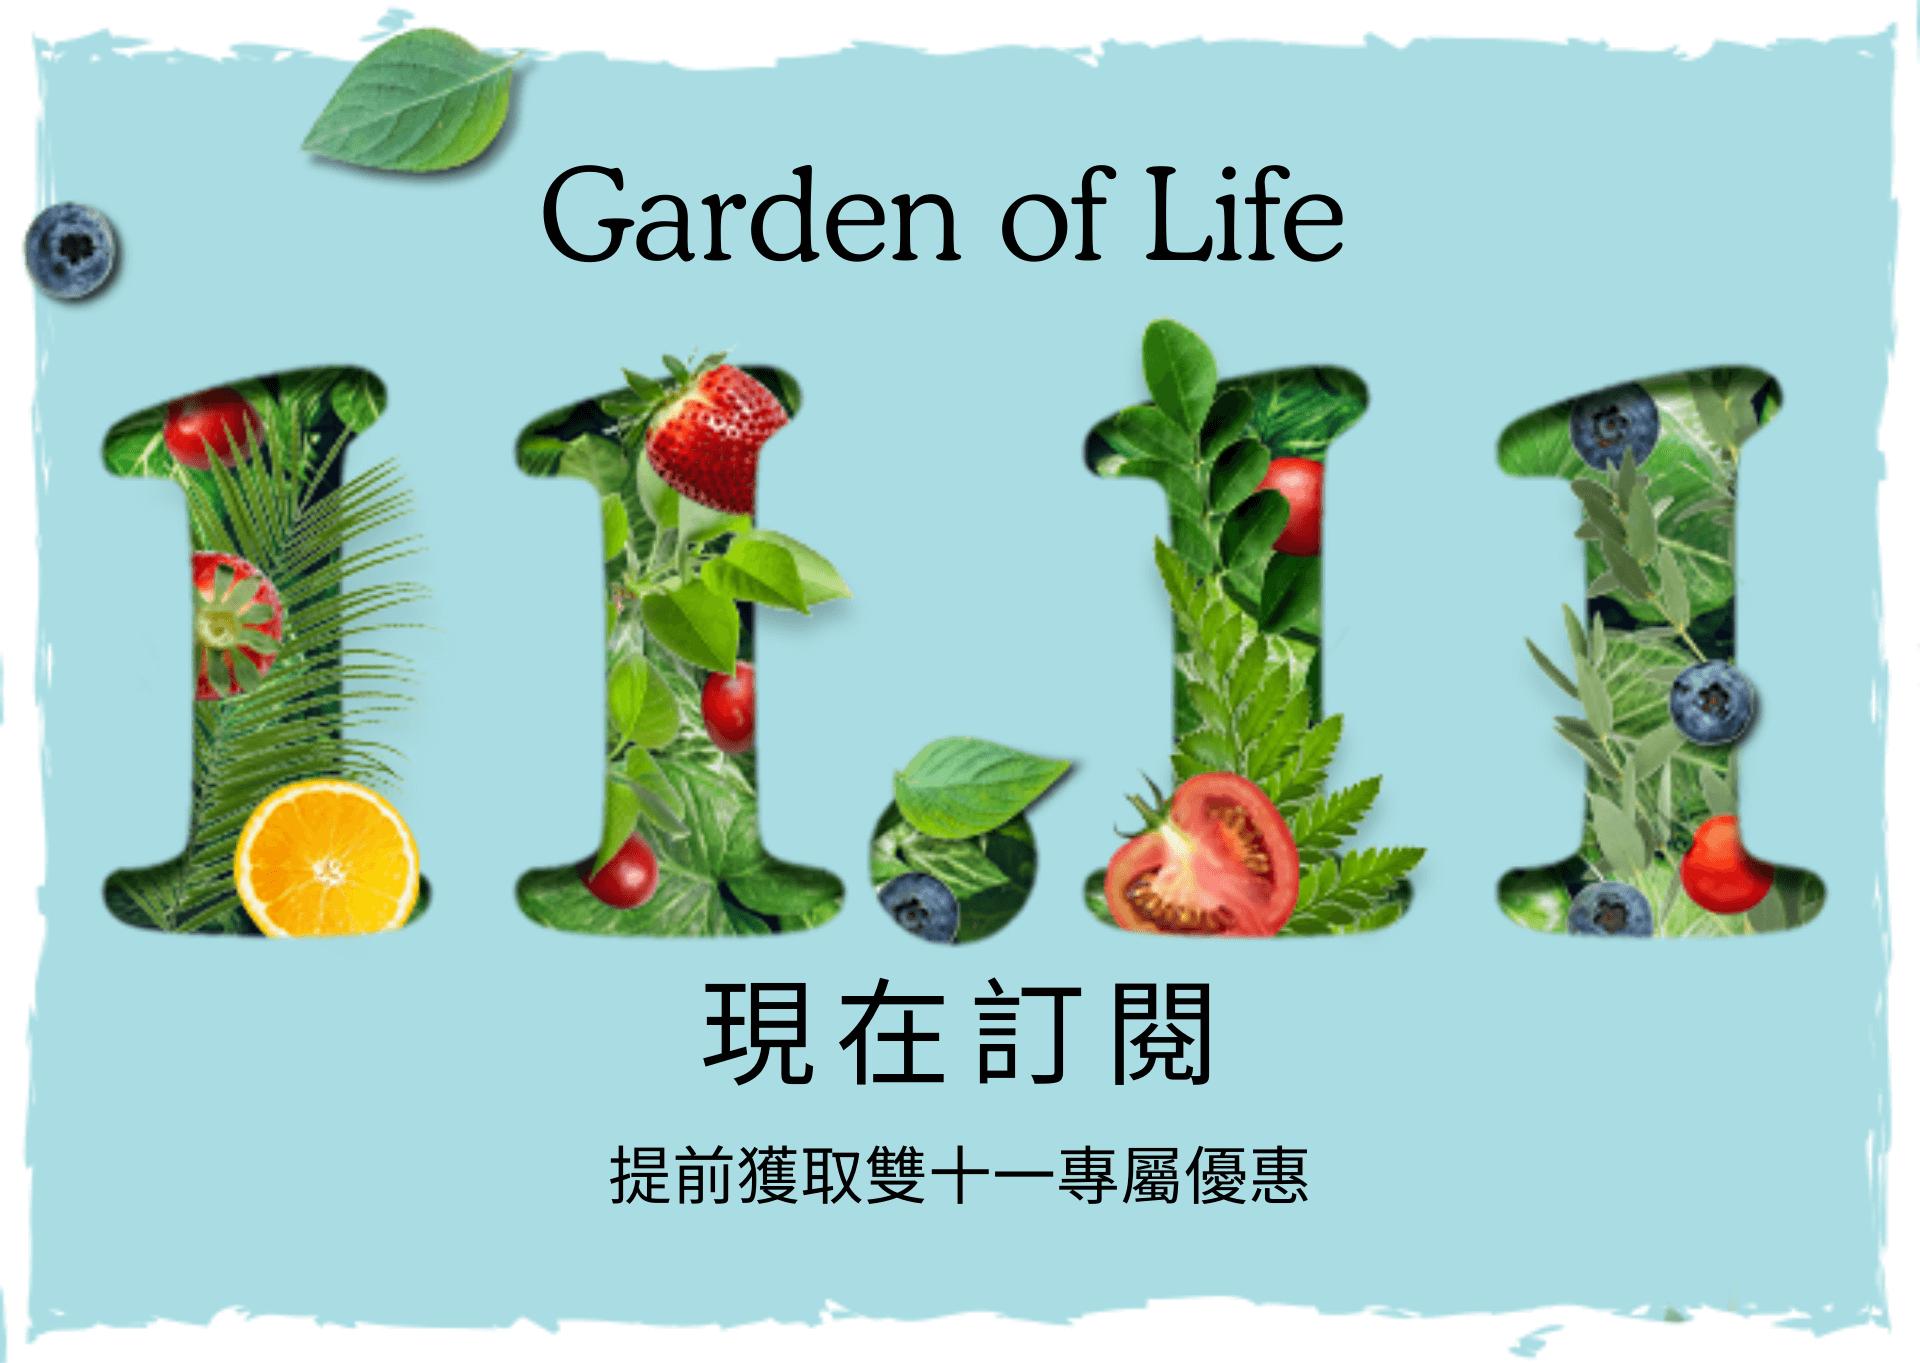 Garden of Life Single's Day